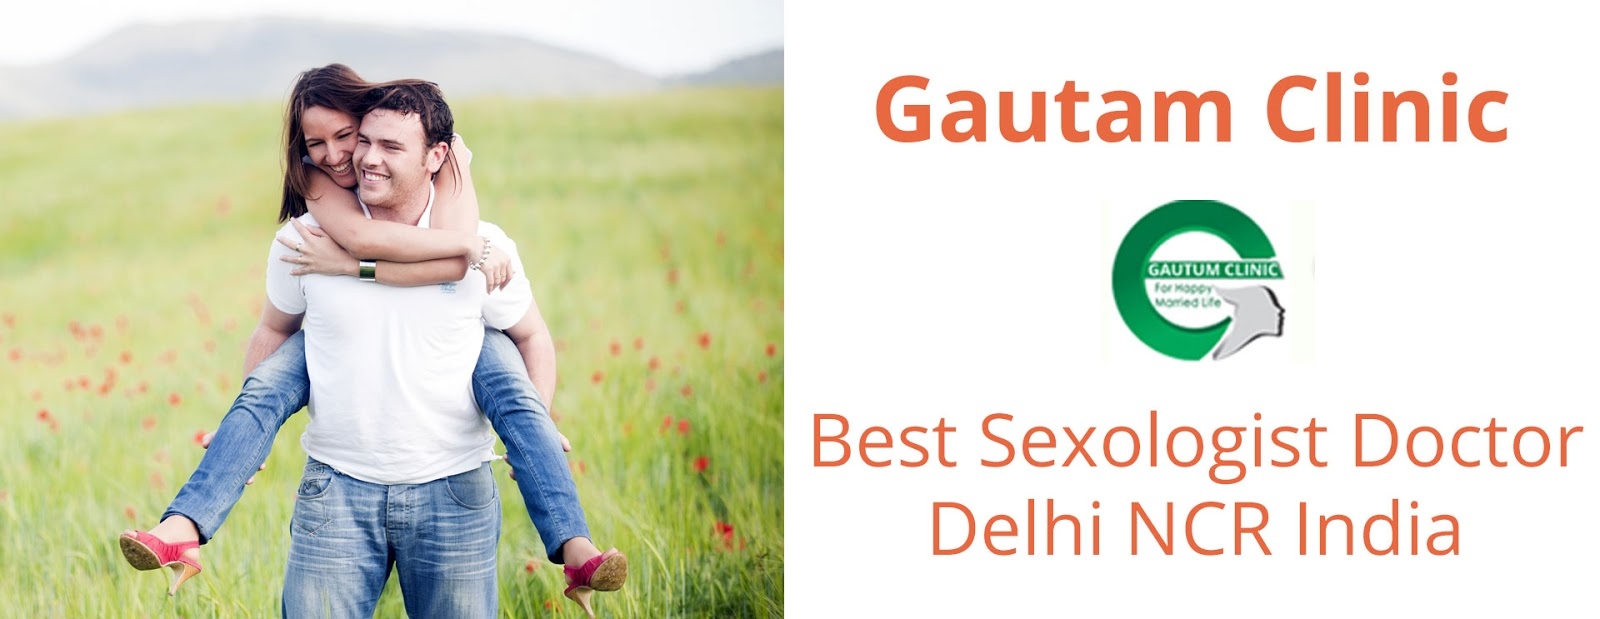 Sexologist in Delhi Ncr